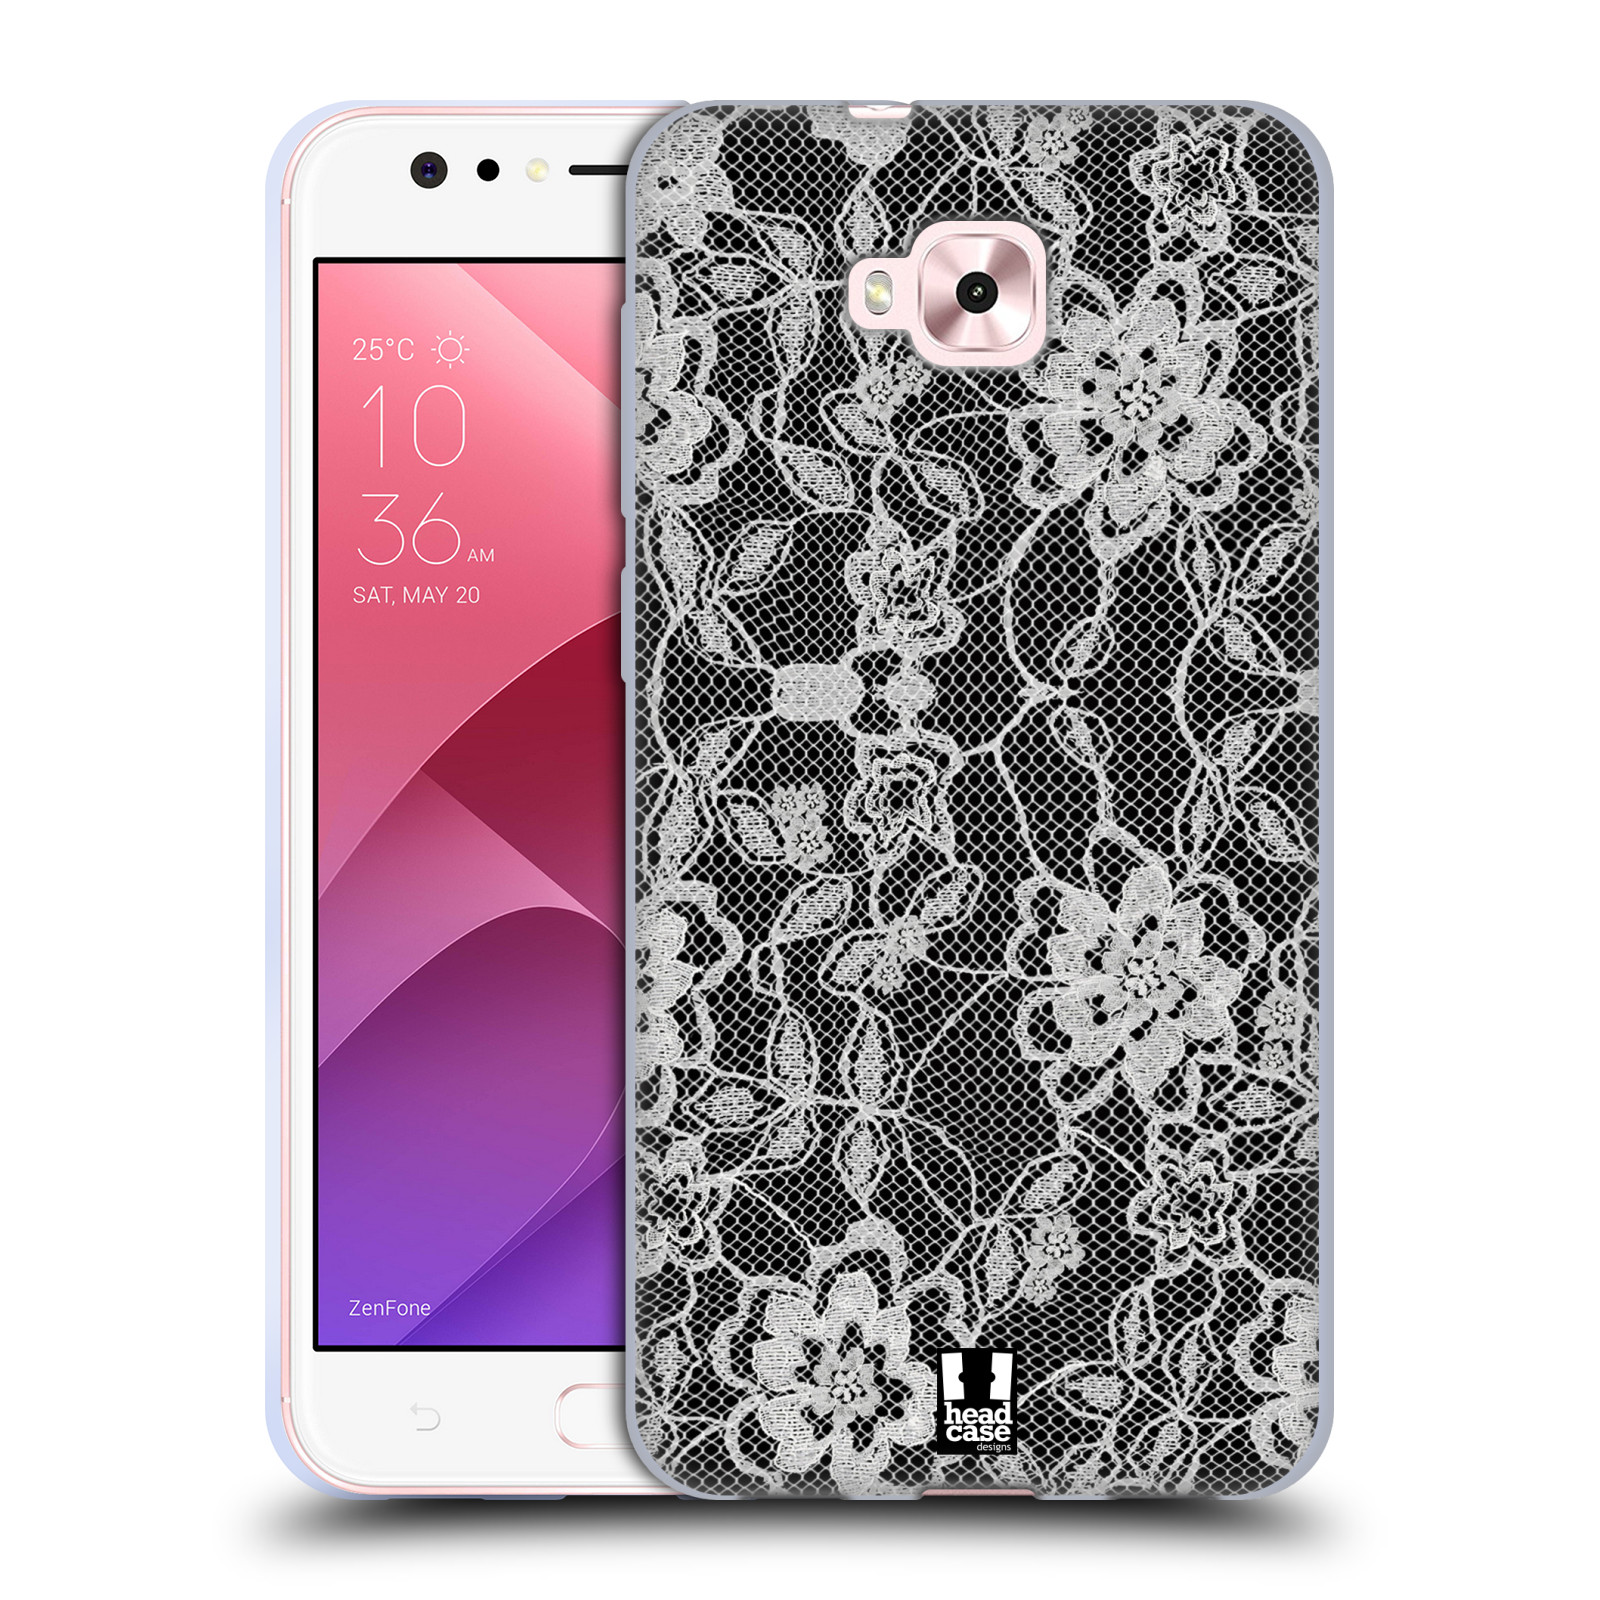 Silikonové pouzdro na mobil Asus Zenfone 4 Selfie ZD553KL - Head Case - FLOWERY KRAJKA